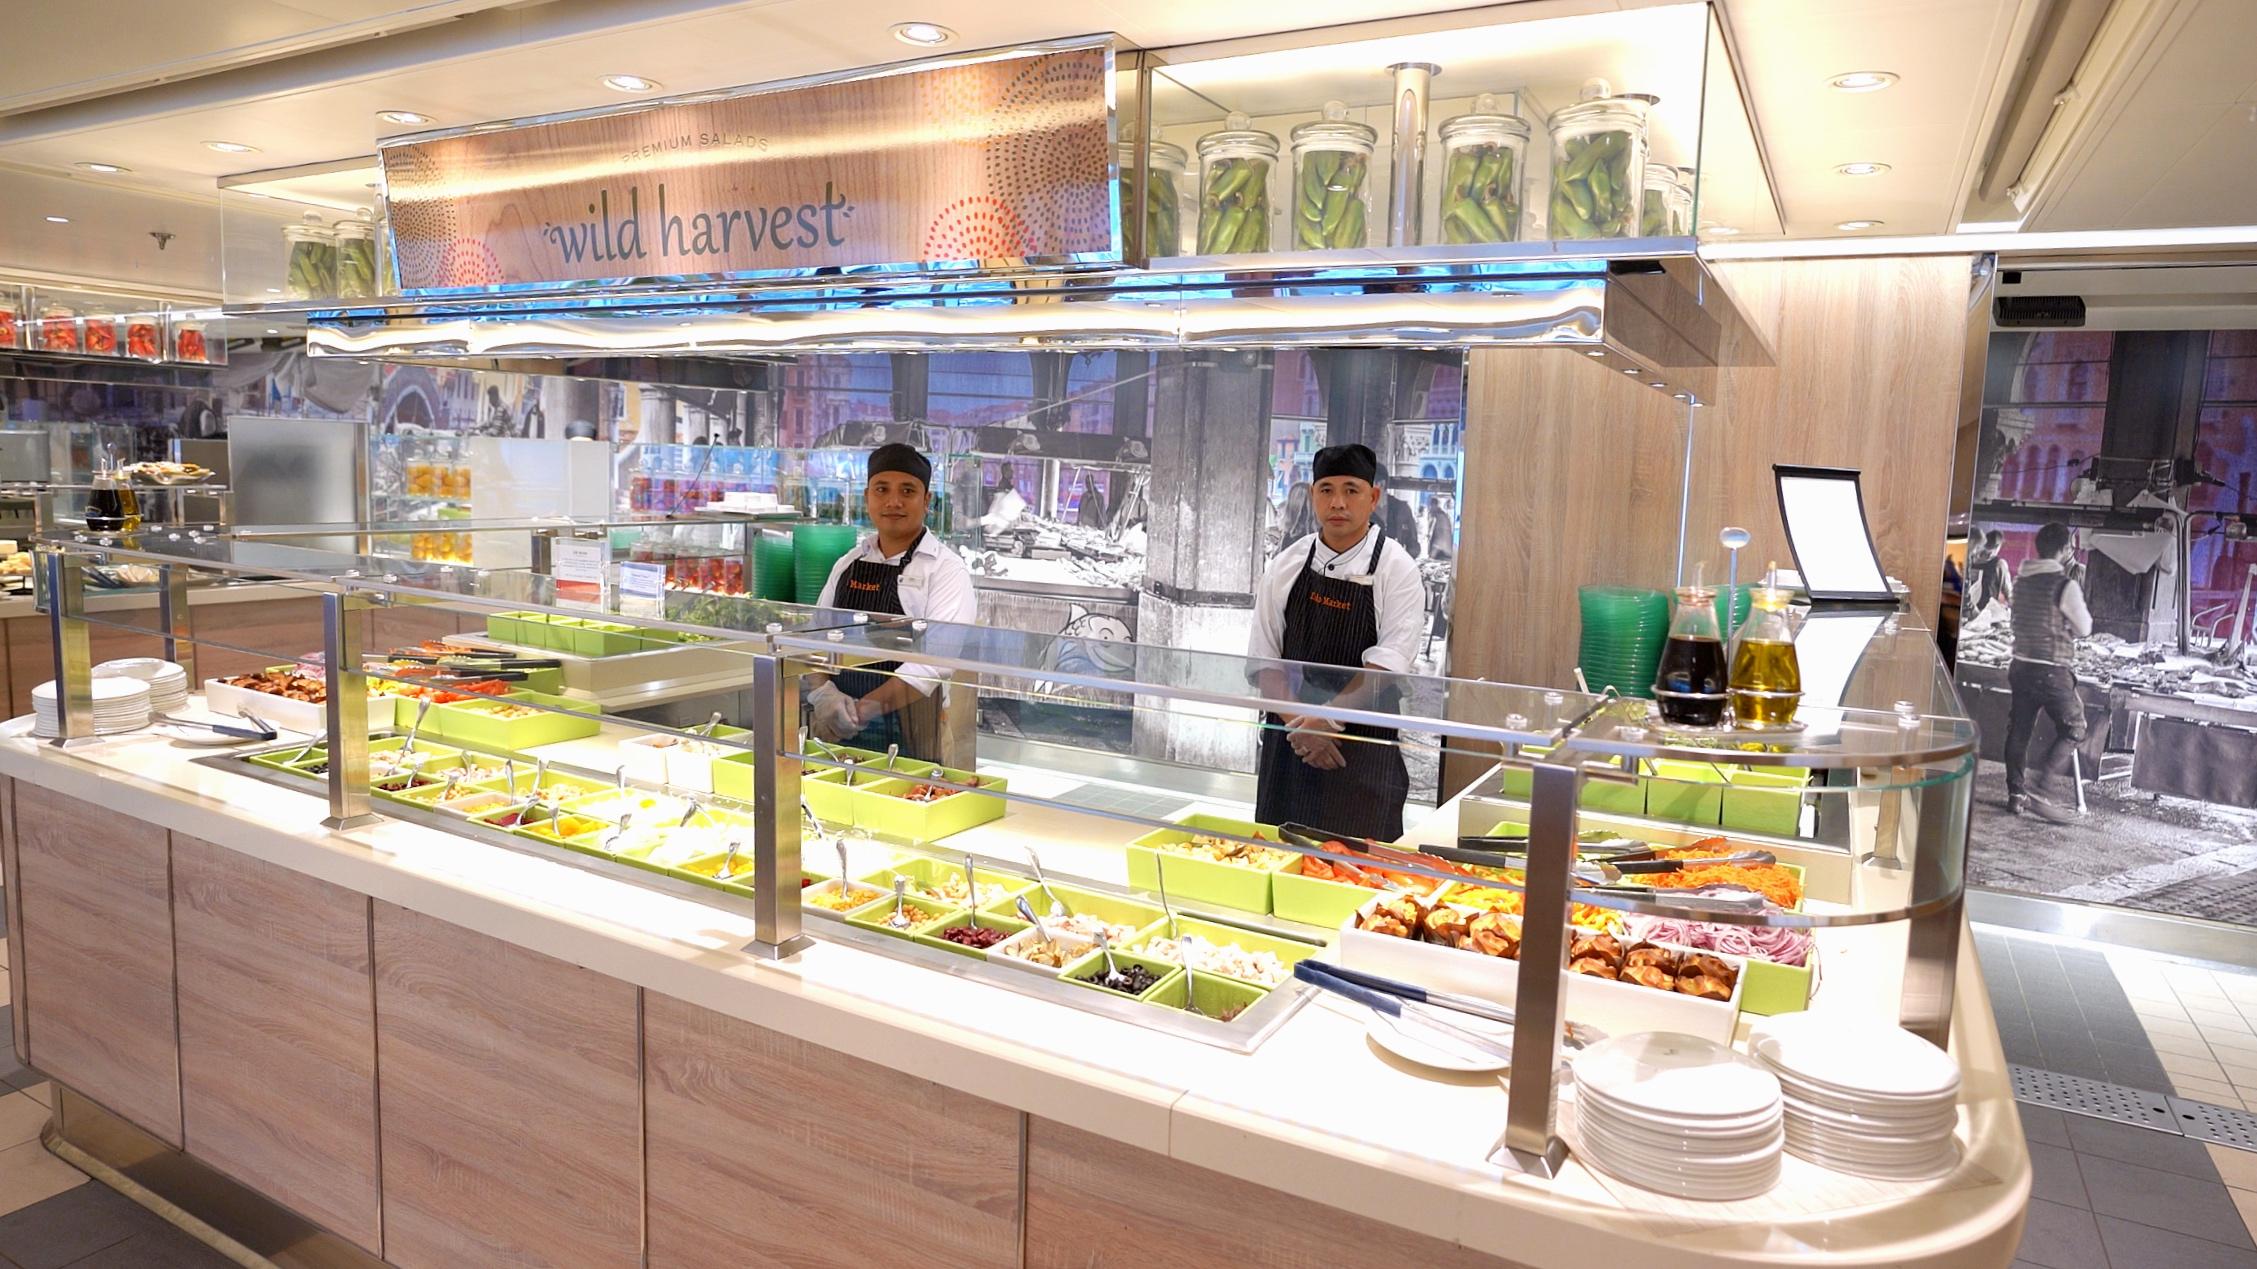 The Lido salad bar